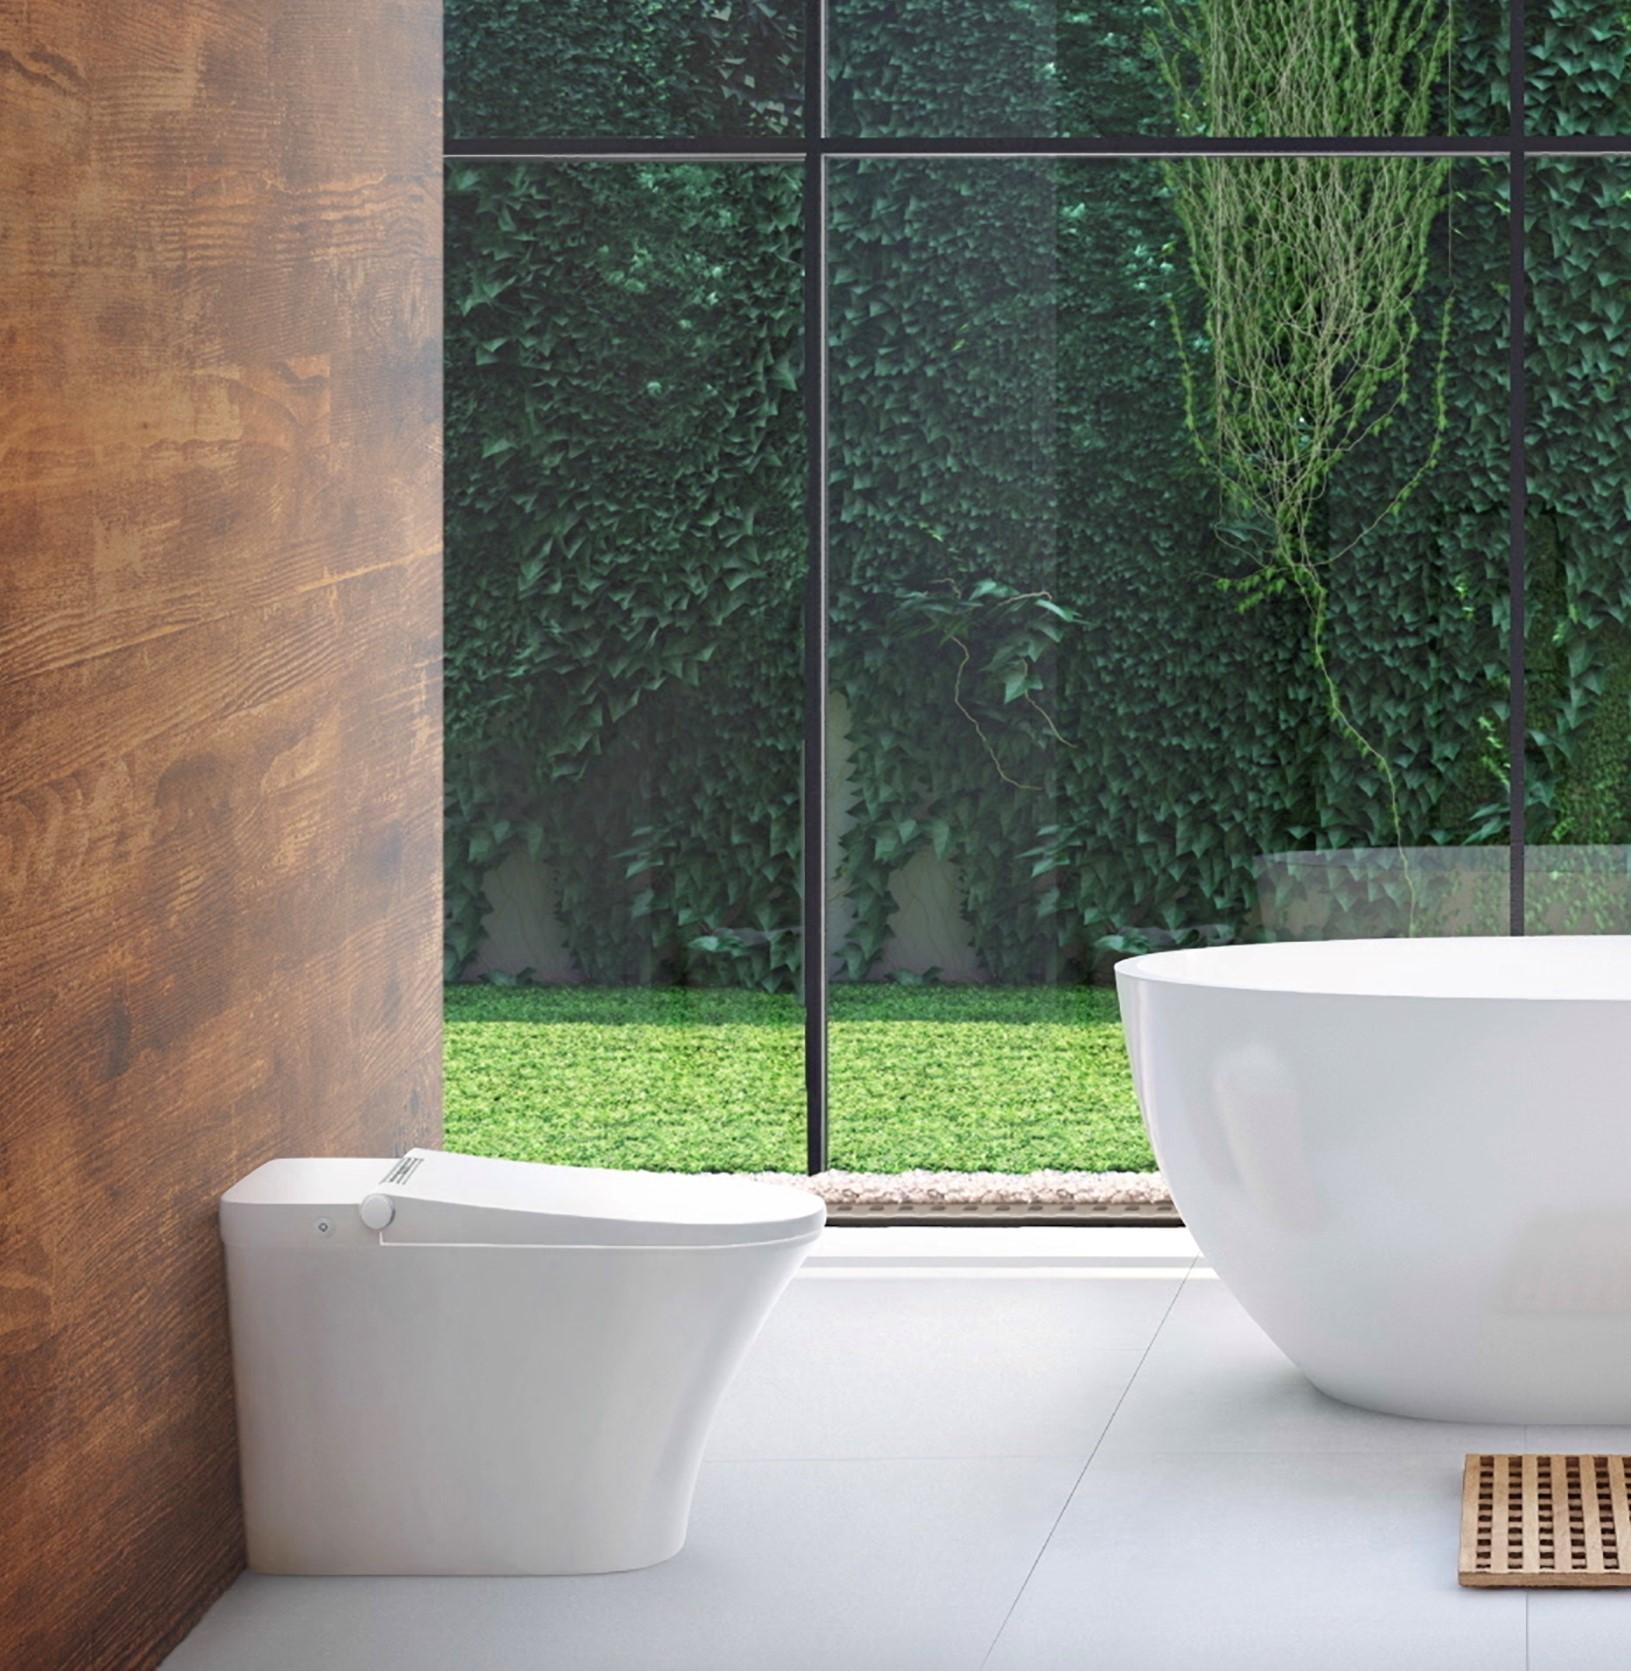 AXENT_AXENT.ONECPlus Spa Bathroom Vignette Crop